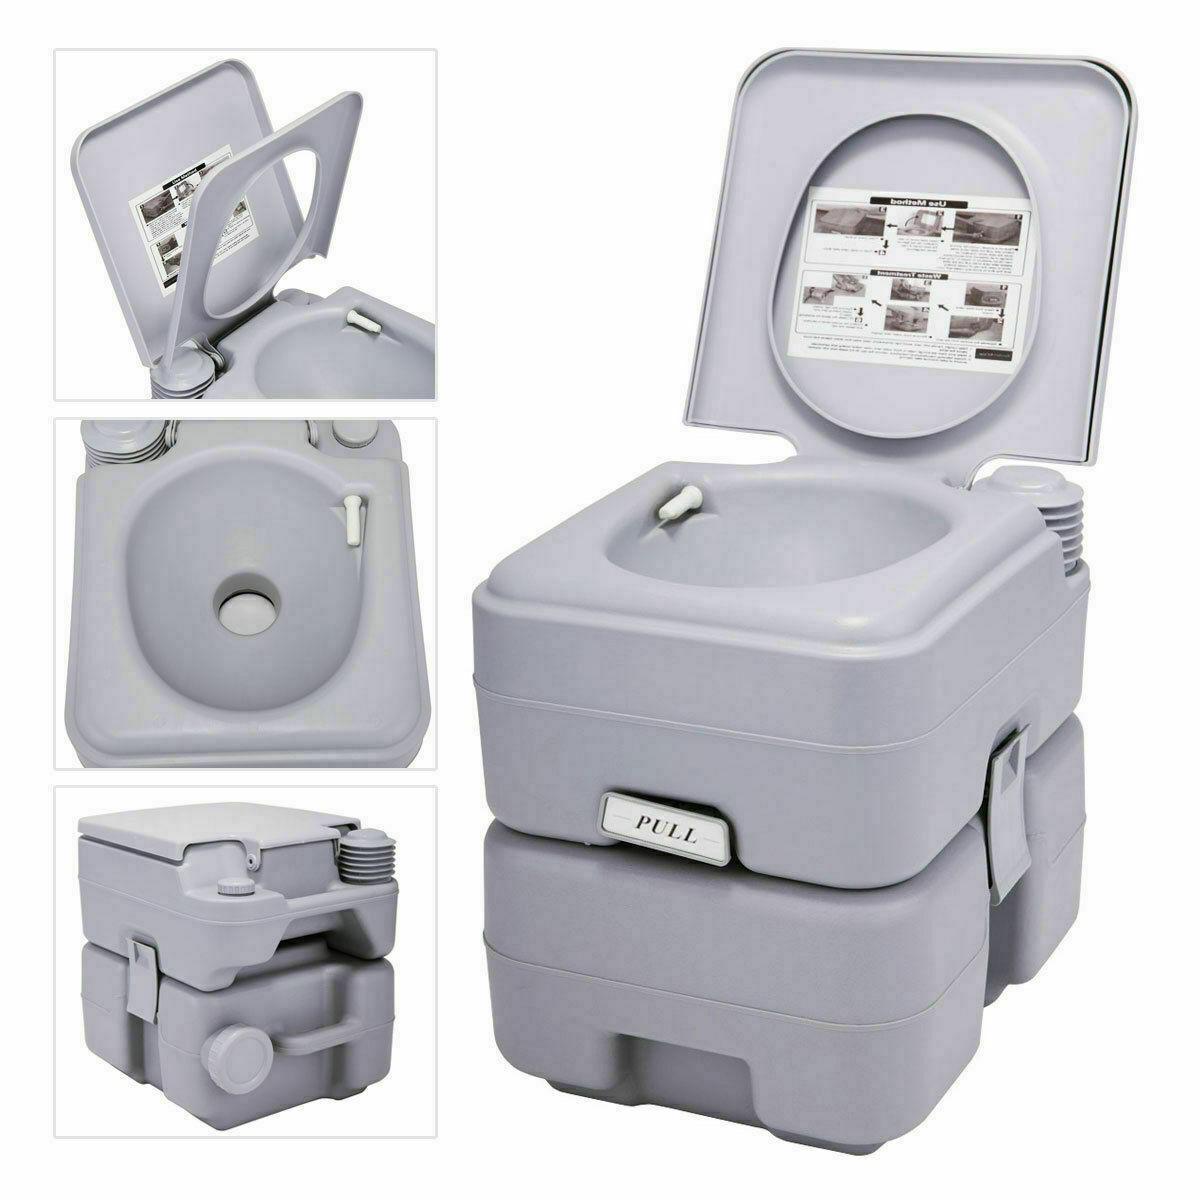 Green 5 Gallon 20L Toilet Flush Travel Camping Commode Potty